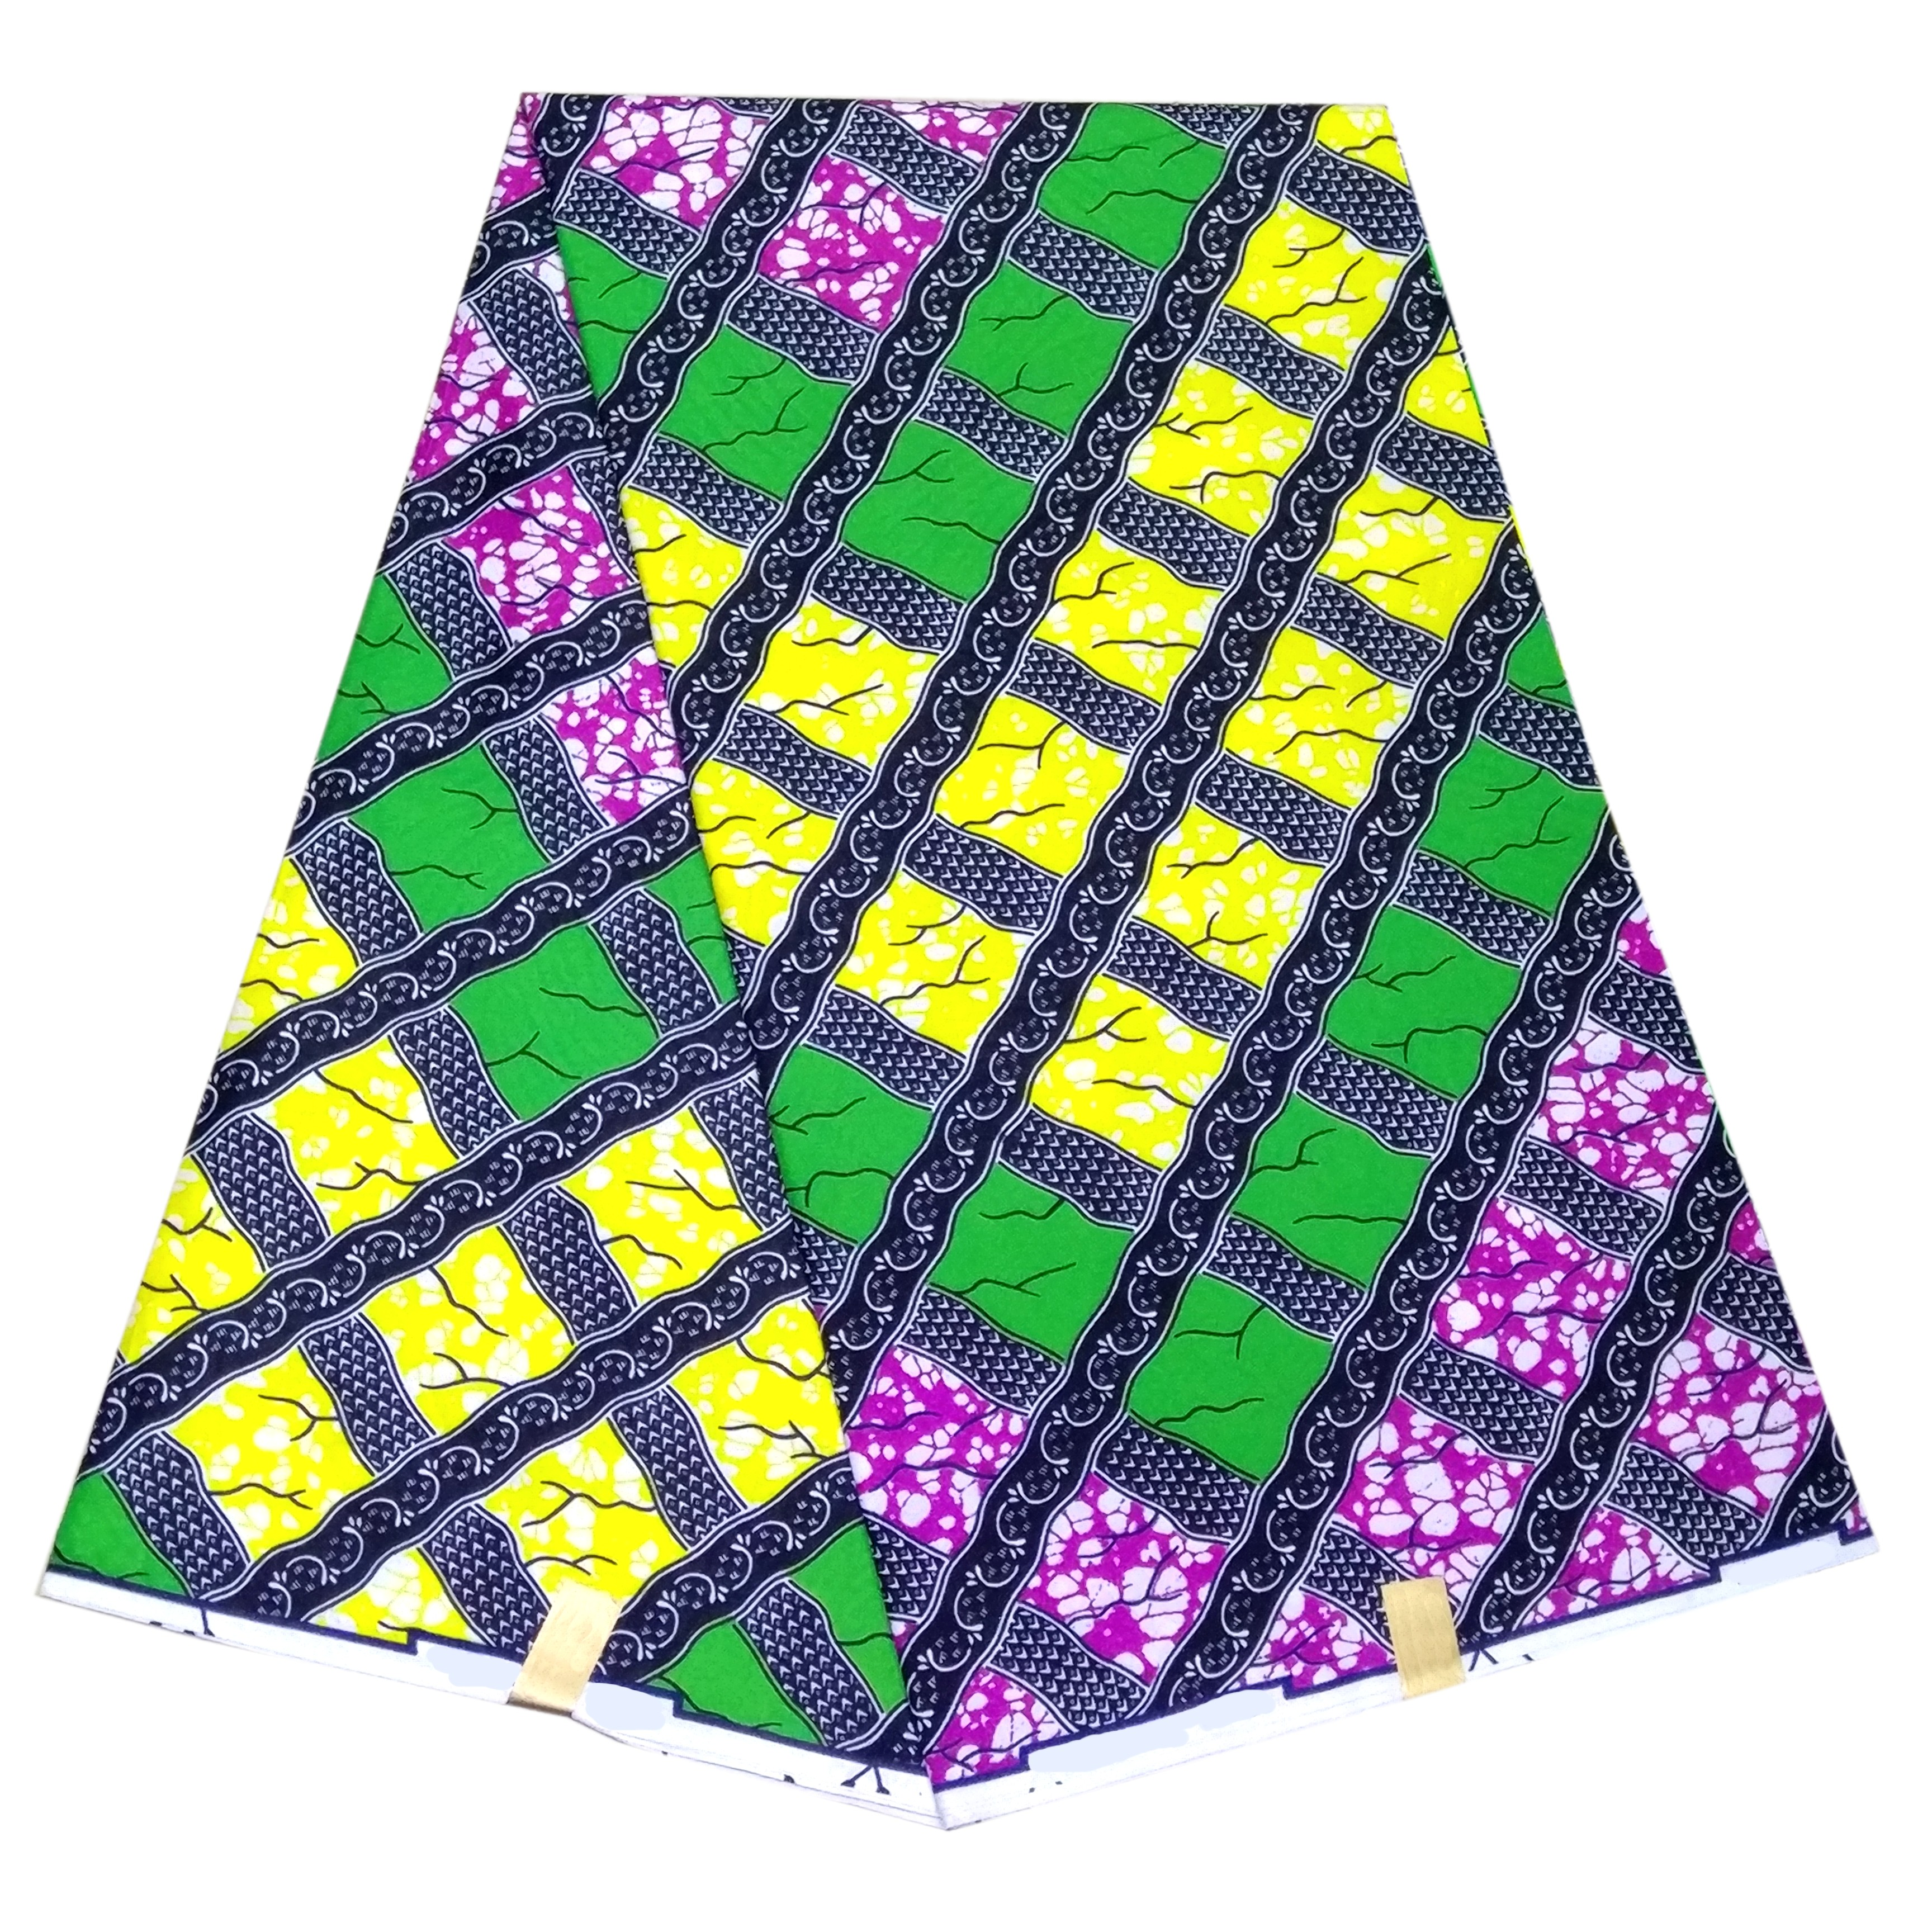 Beautiful Geometry Pattern Ankara African Printing Wax Real Dutch Wax Fabric High Quality Fabric 6yards Lot